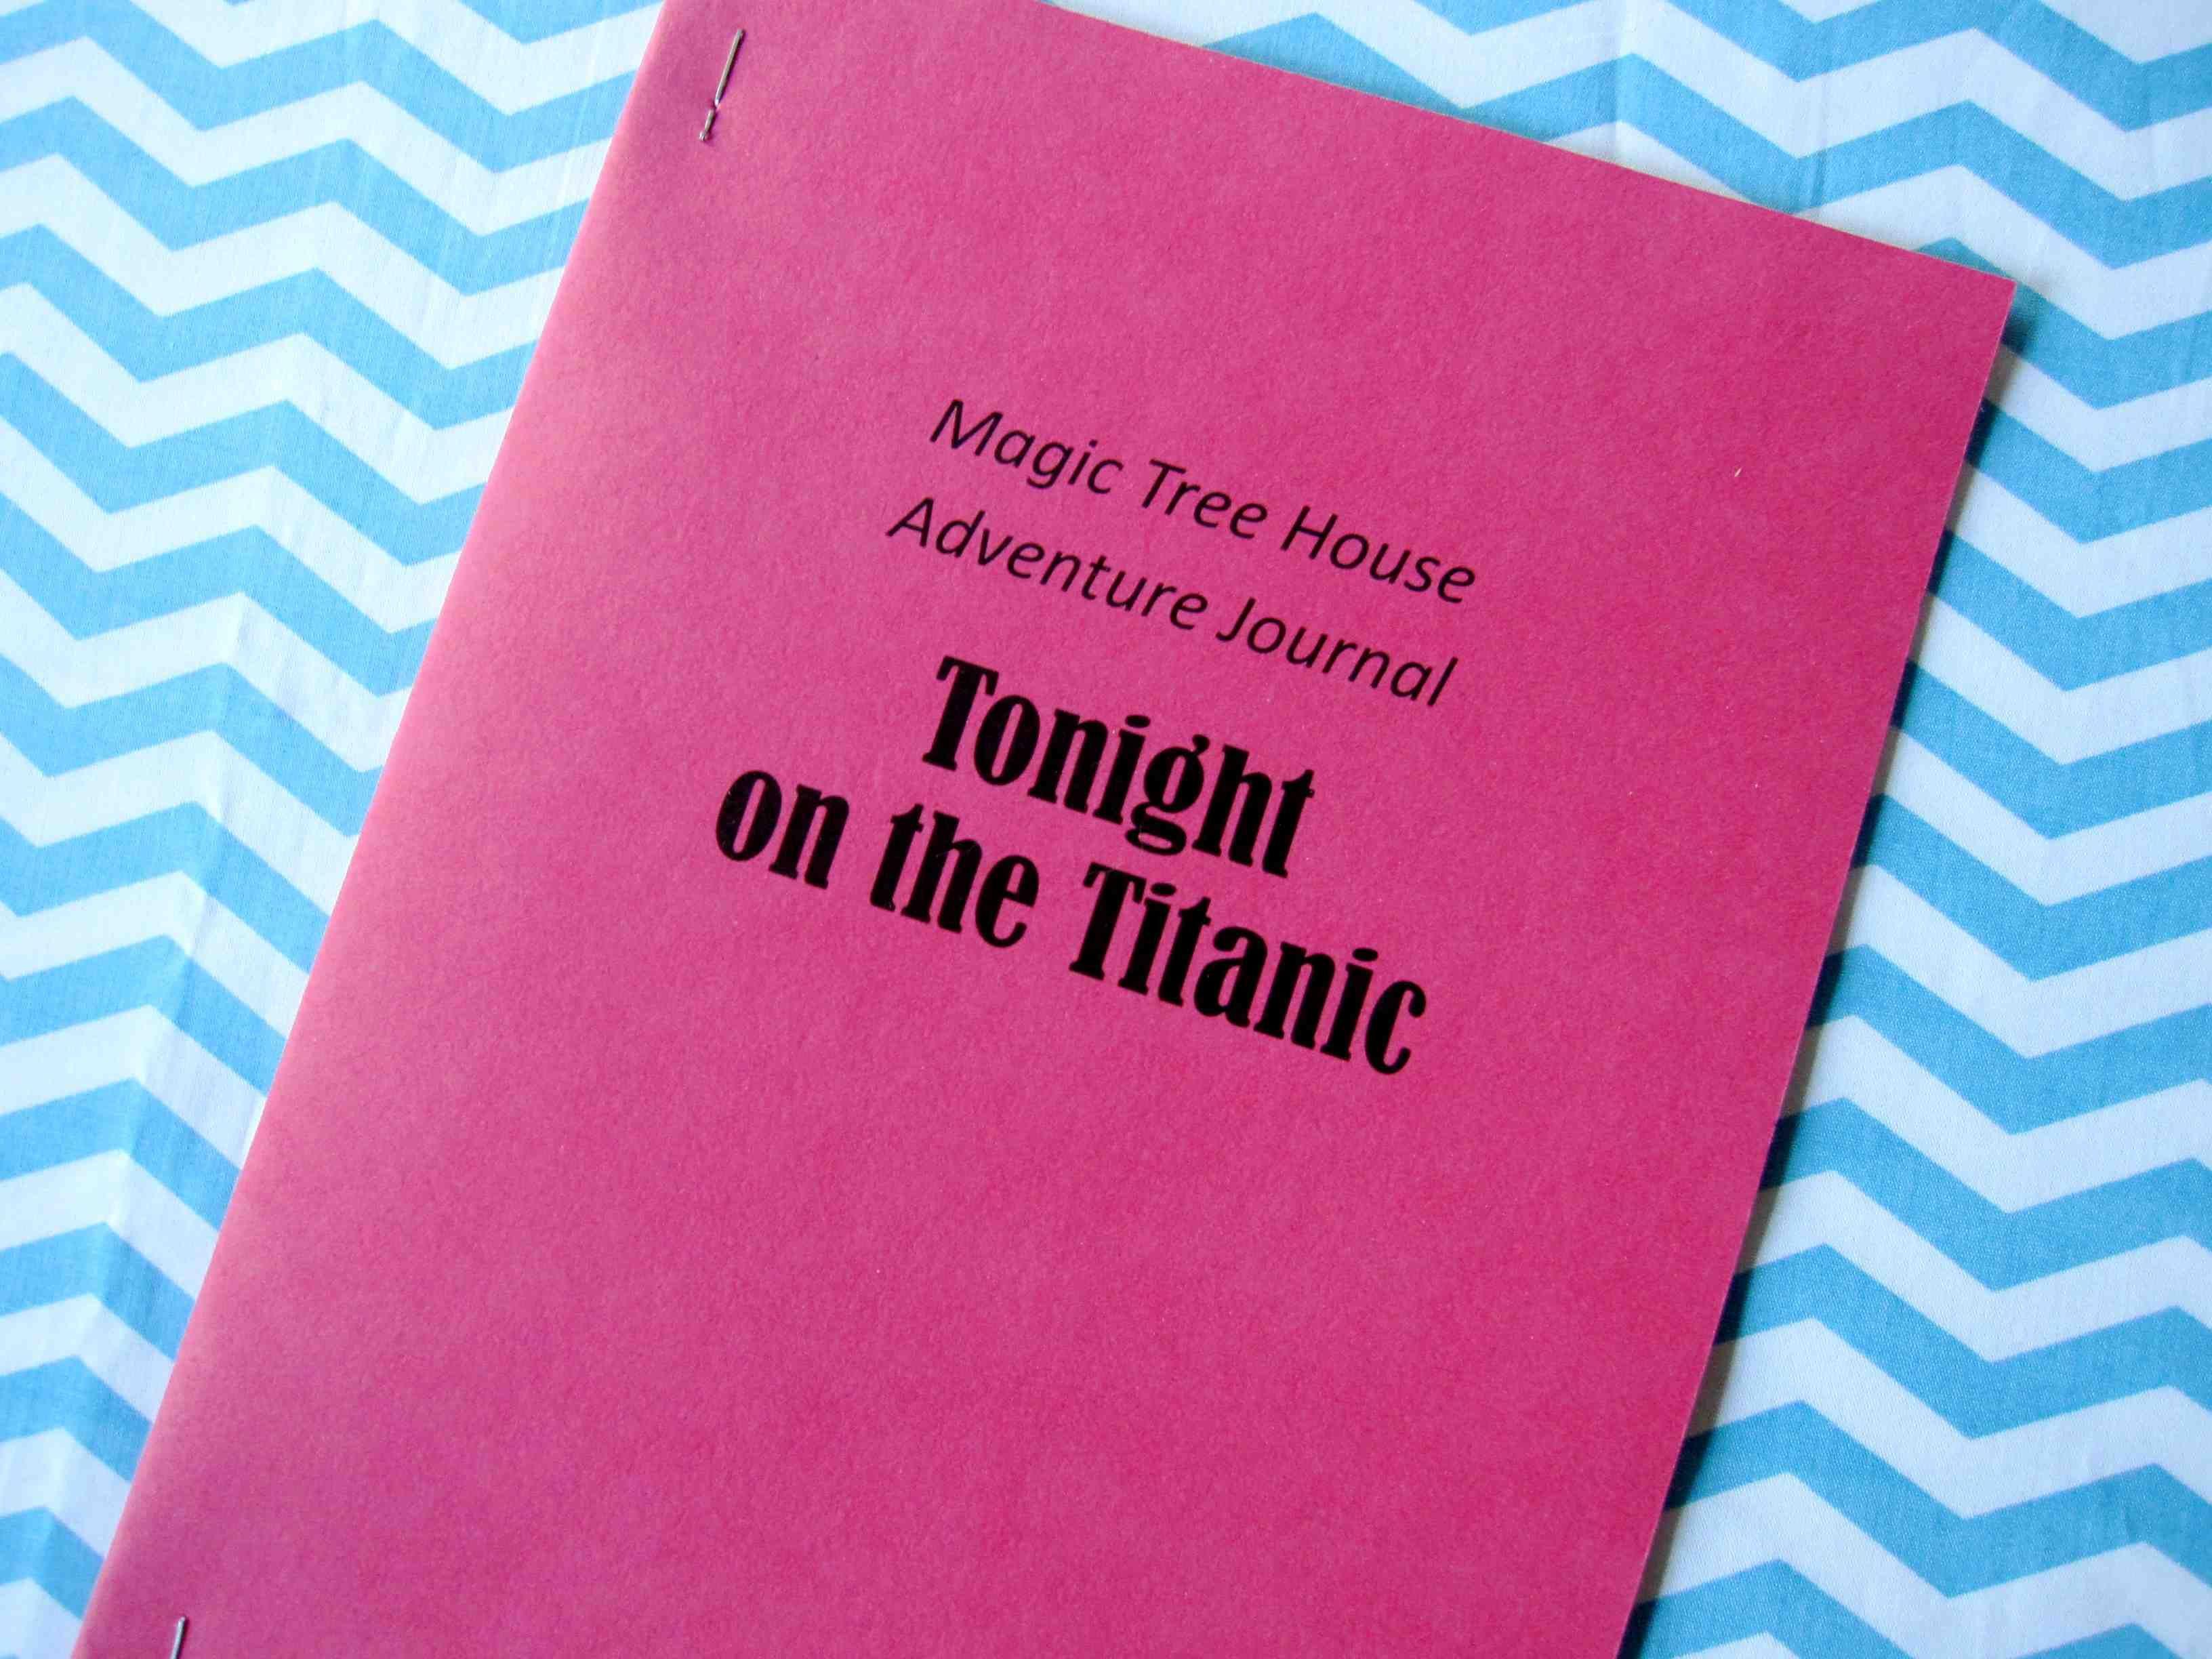 Tonight On The Titanic Unit Study